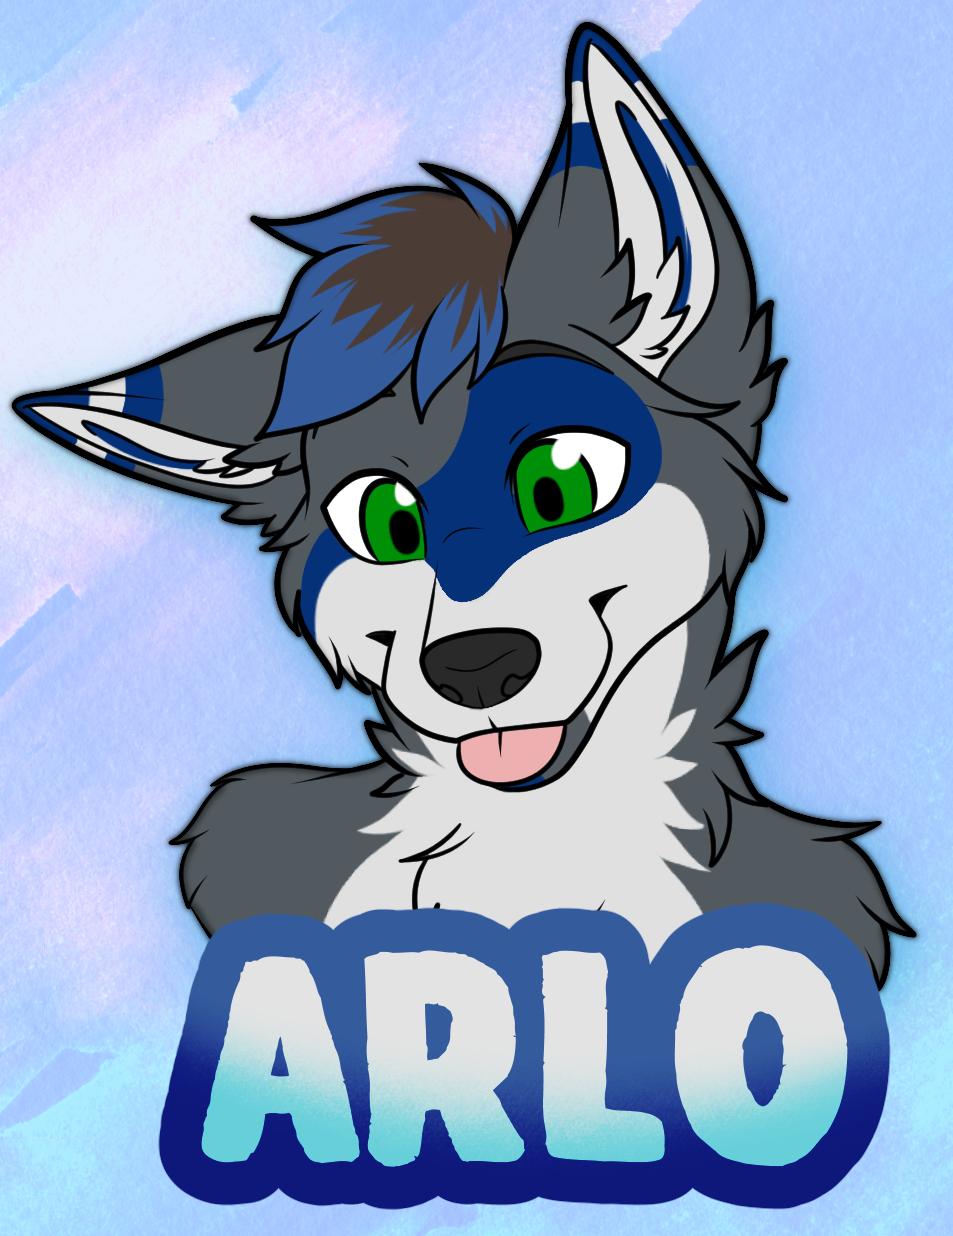 arlo badge for web